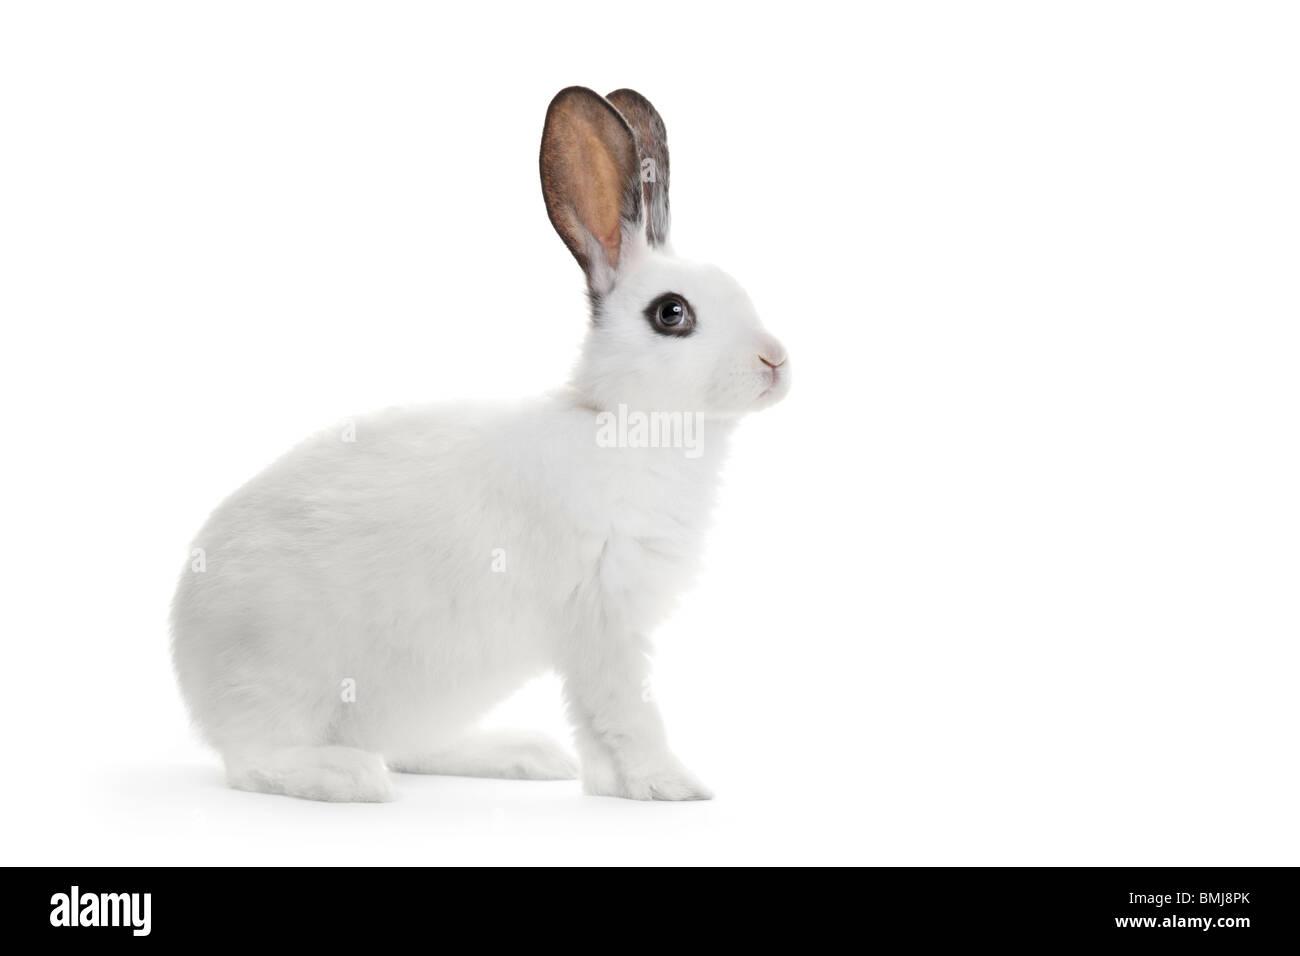 A white rabbit - Stock Image